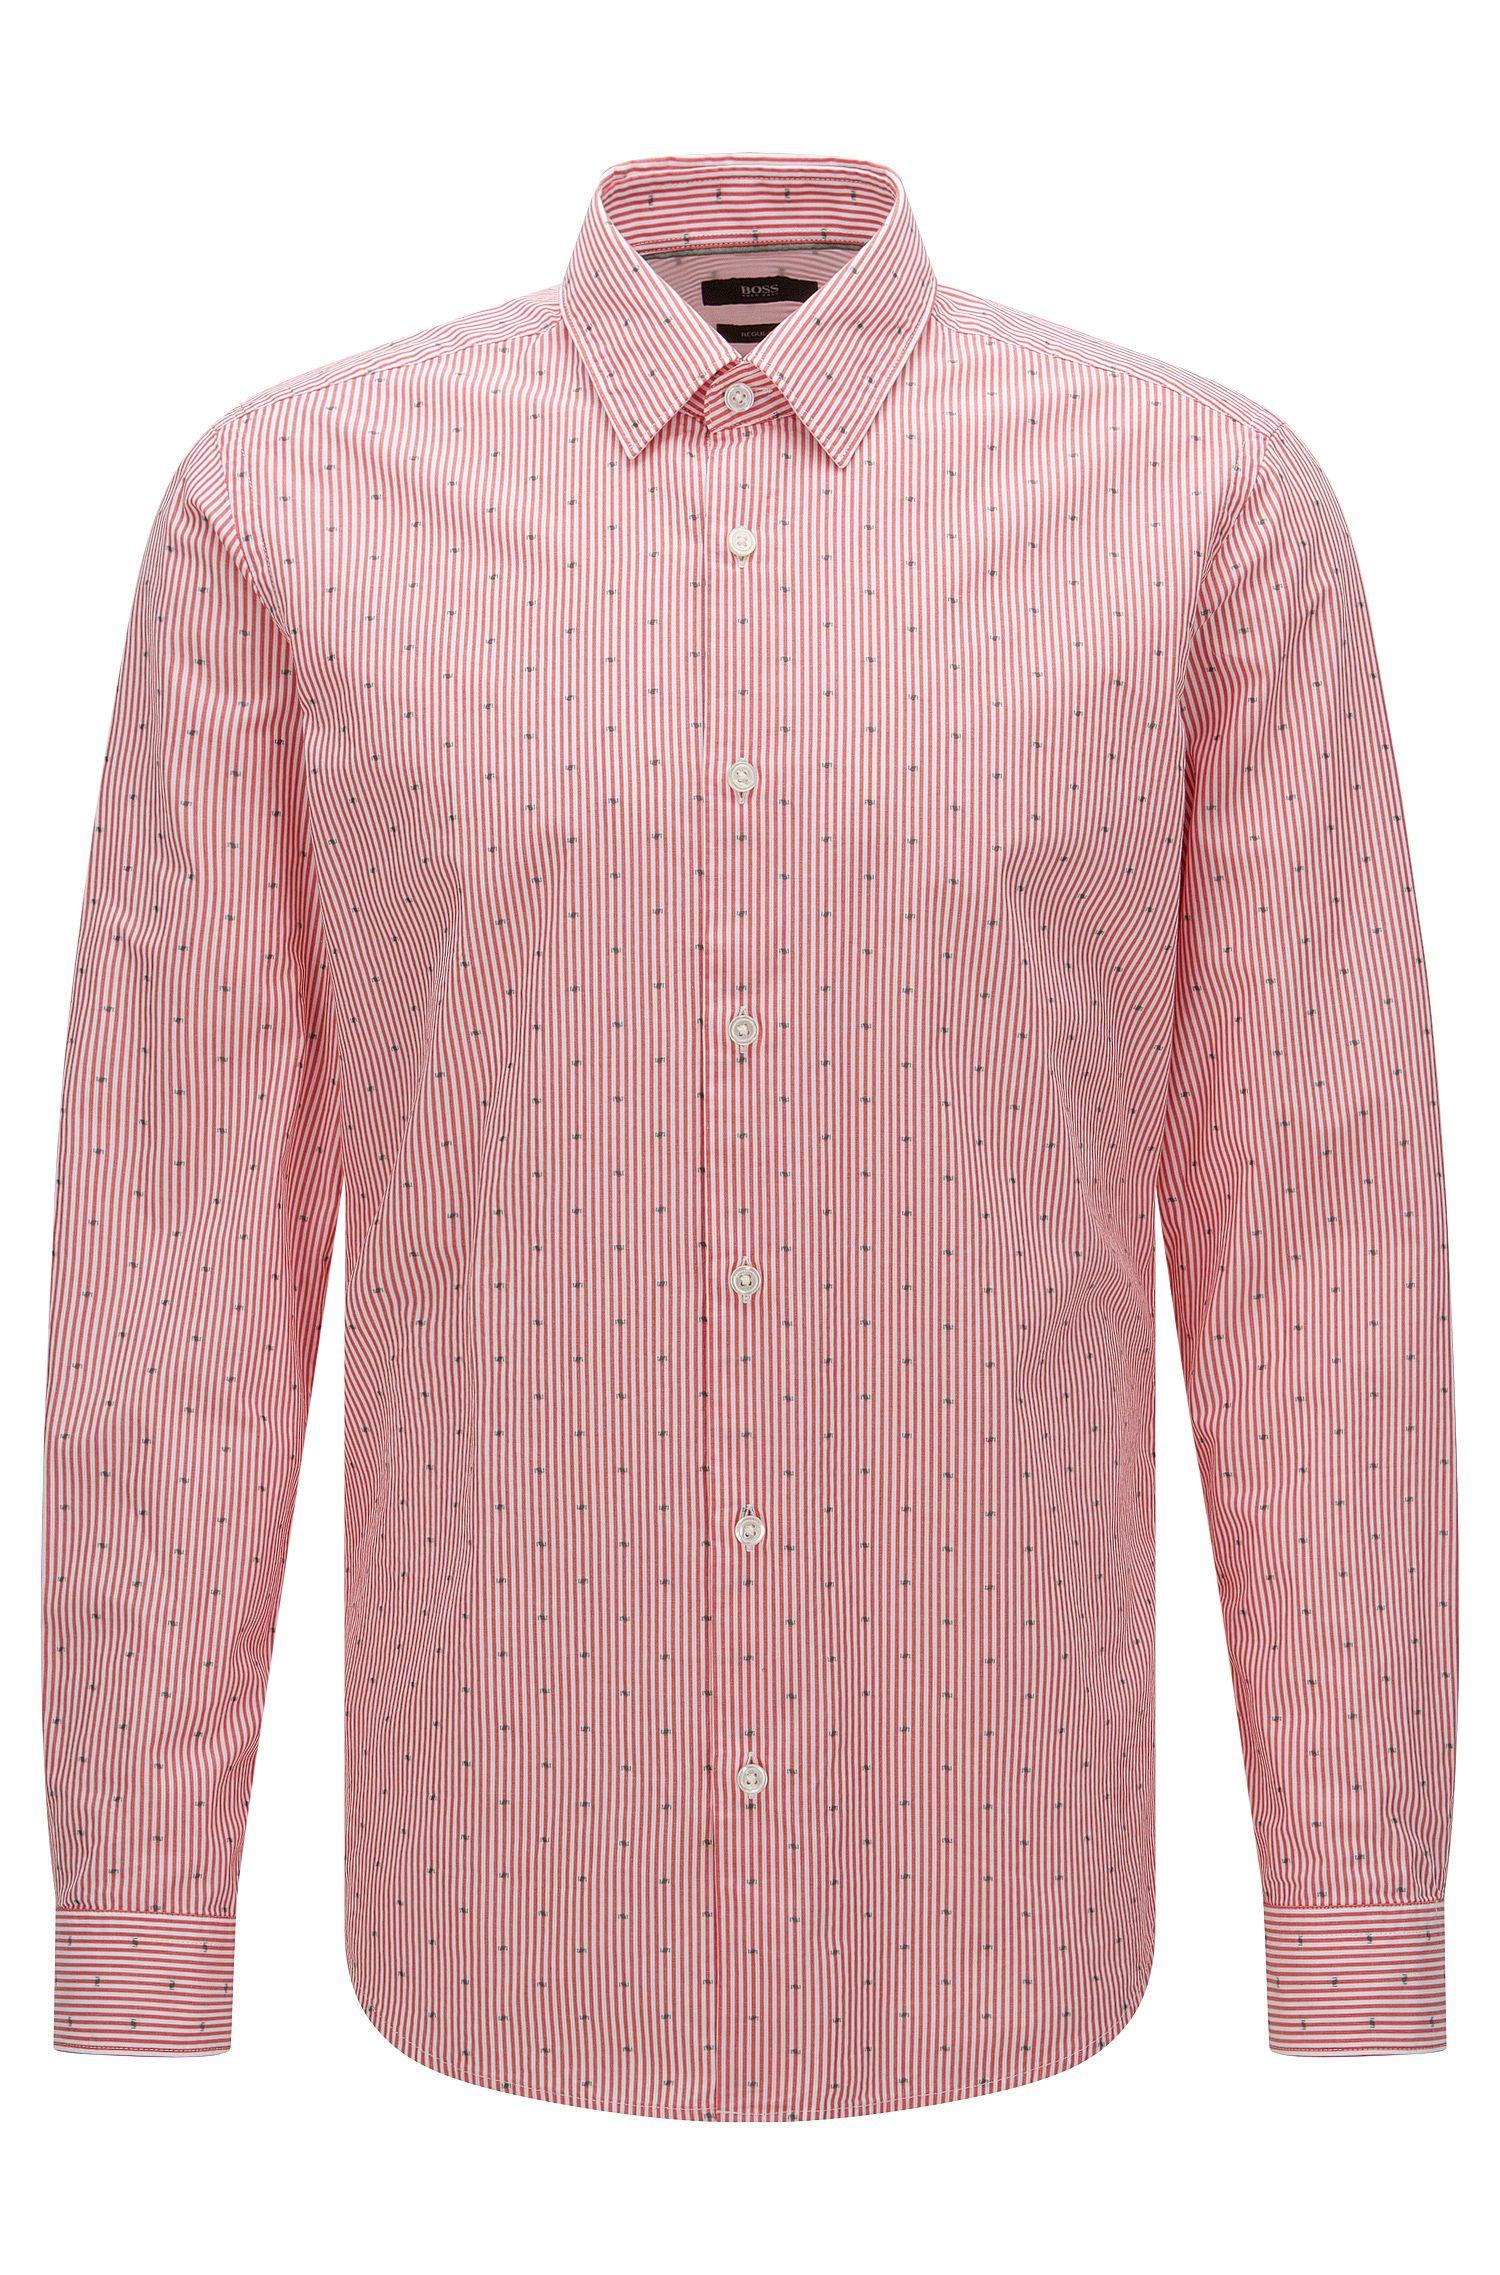 Gestreiftes Regular-Fit Hemd aus Baumwolle: 'Lukas_32F'